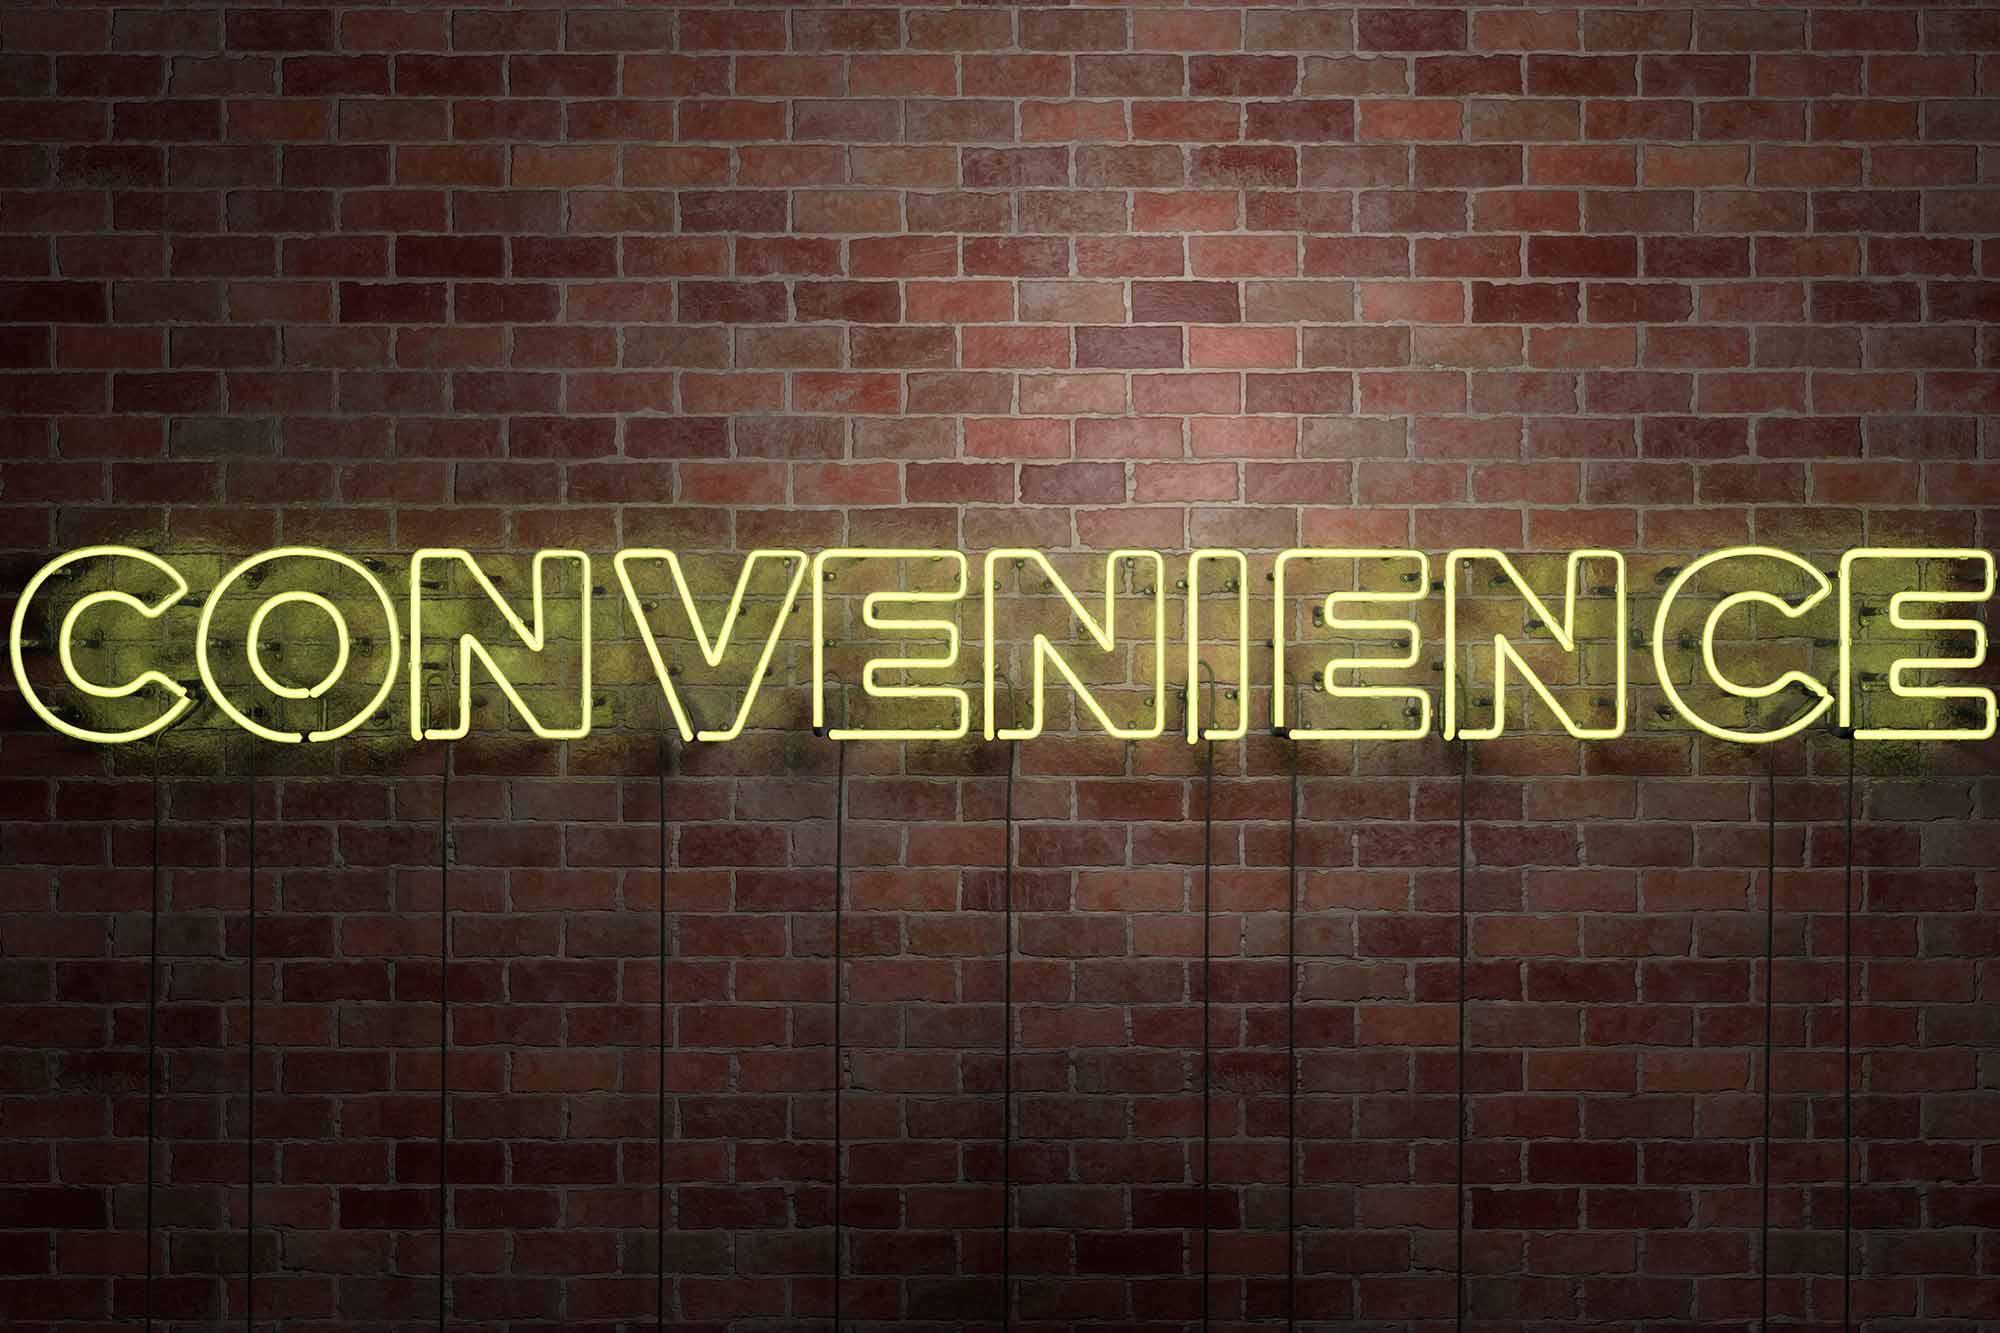 CONVENIENCE - fluorescent Neon tube Sign on brickwork